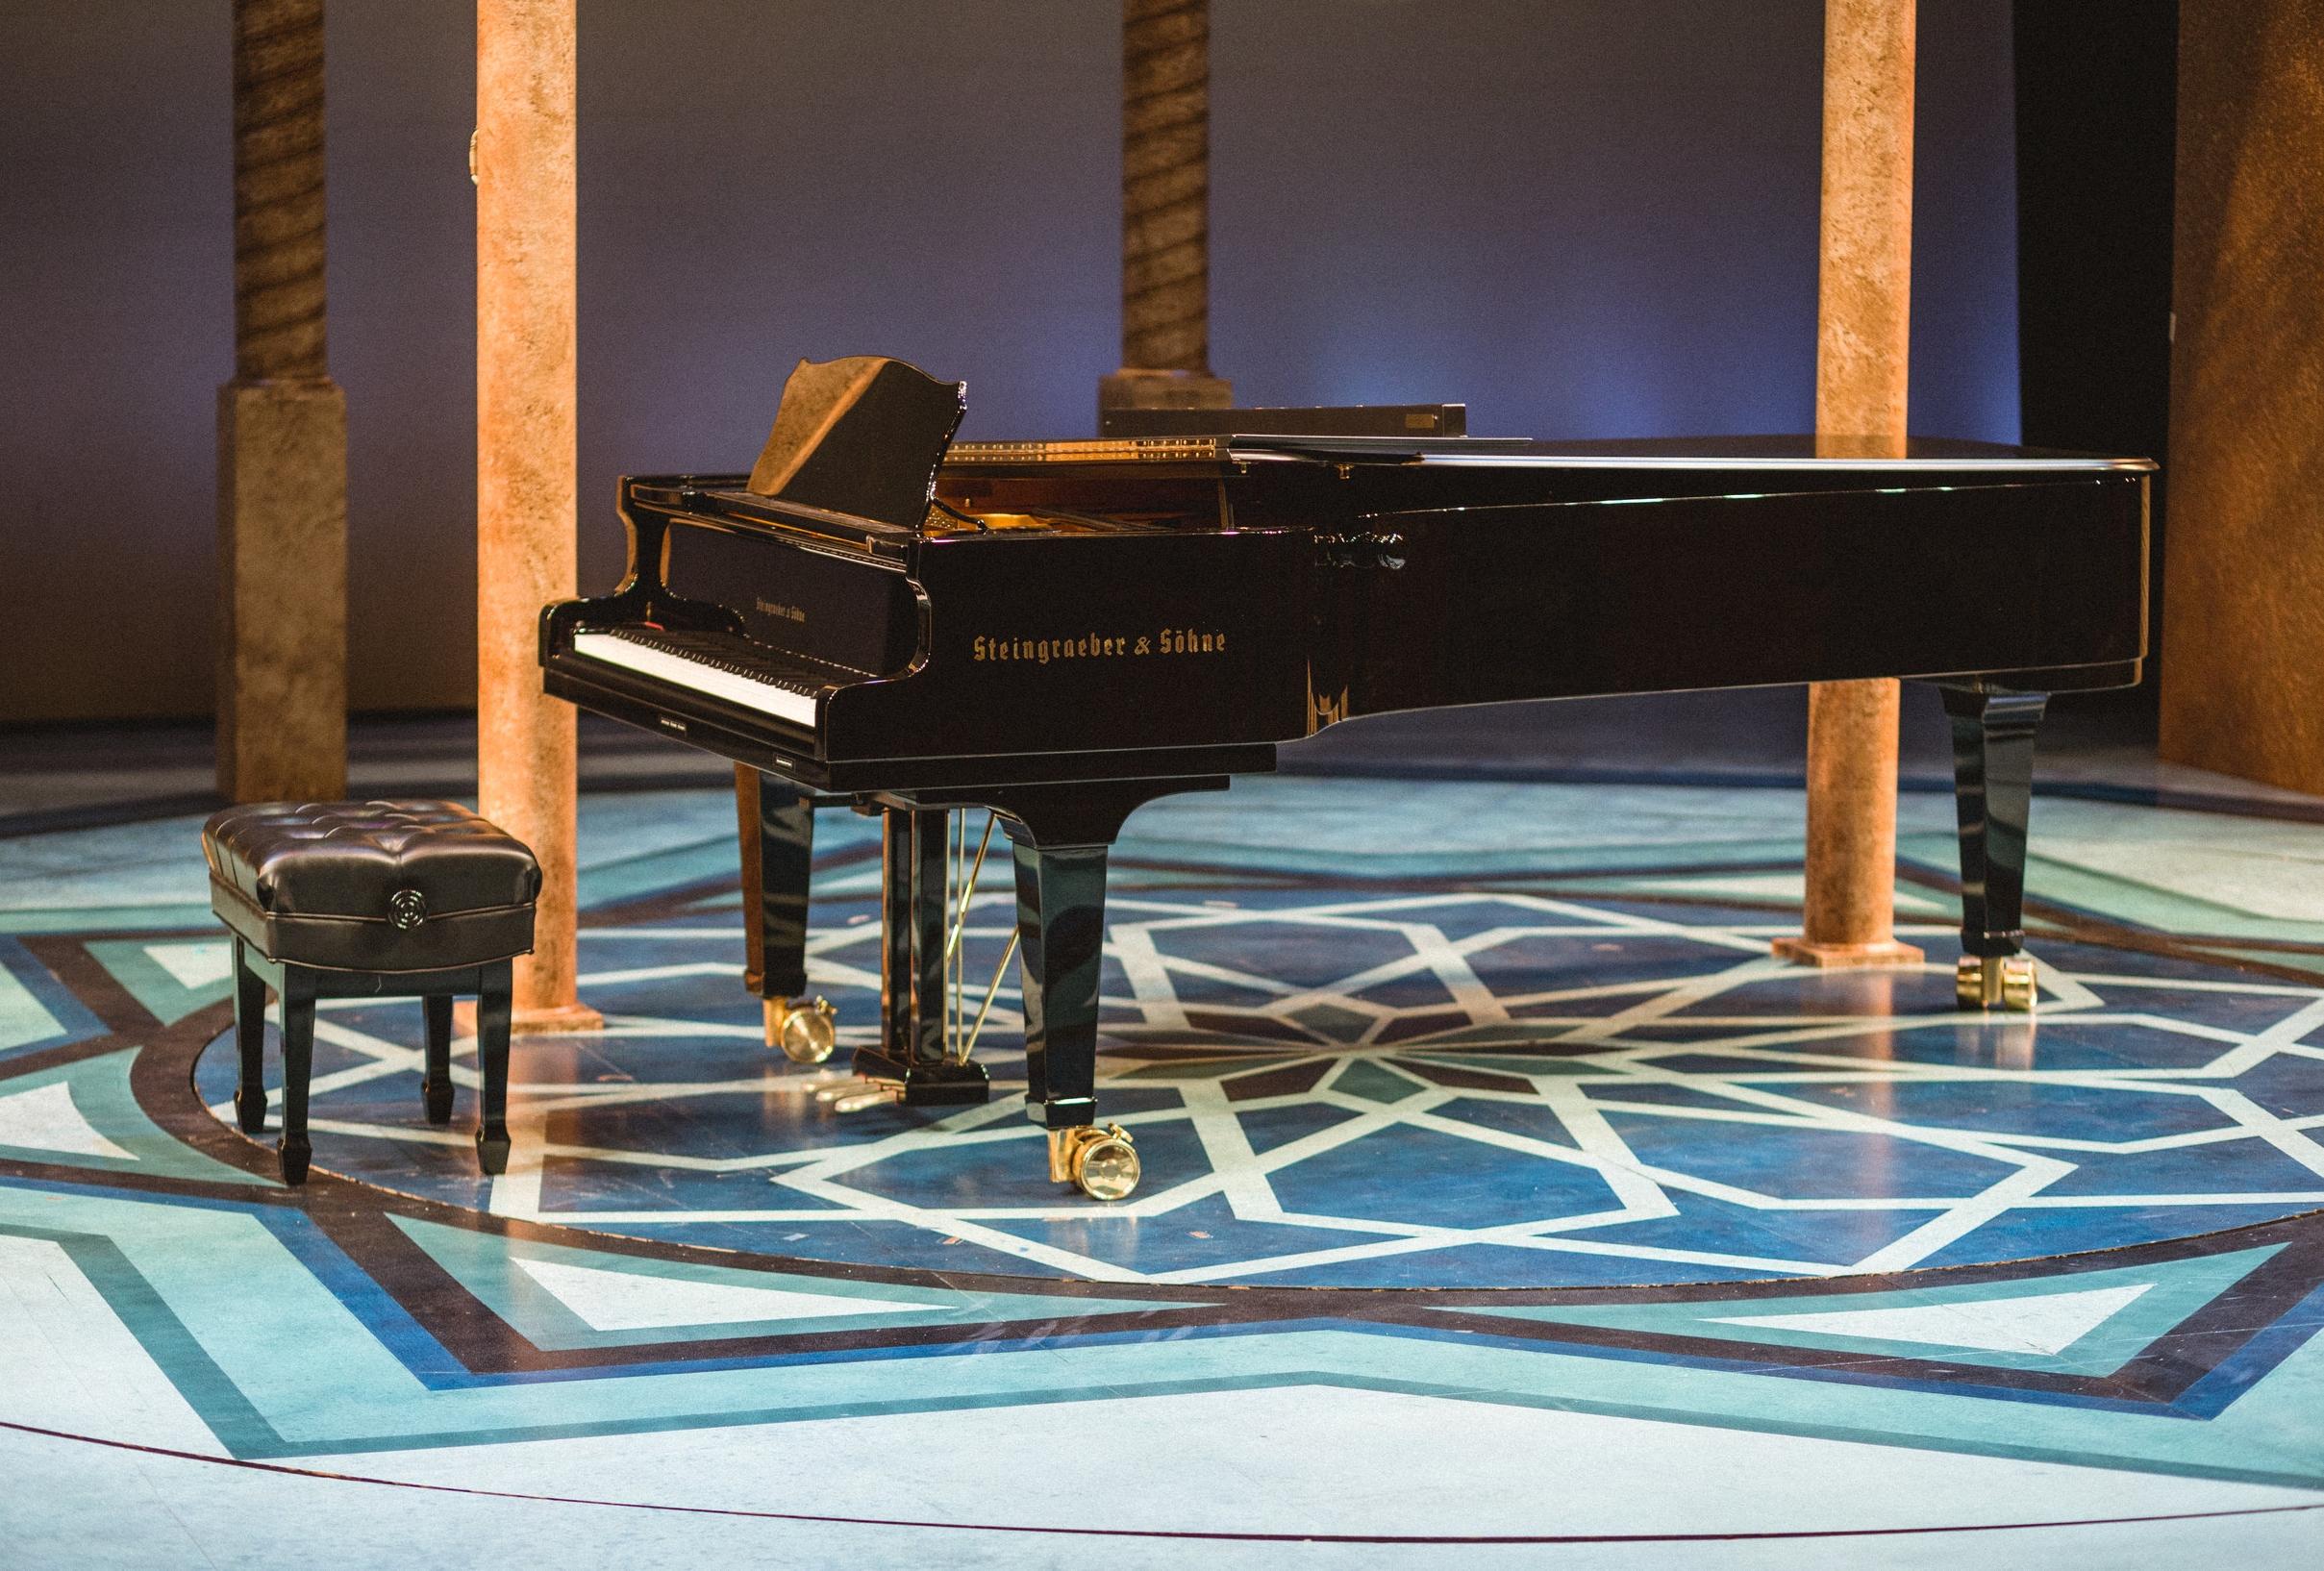 Steingraeber & Söhne provided by PianoCraft